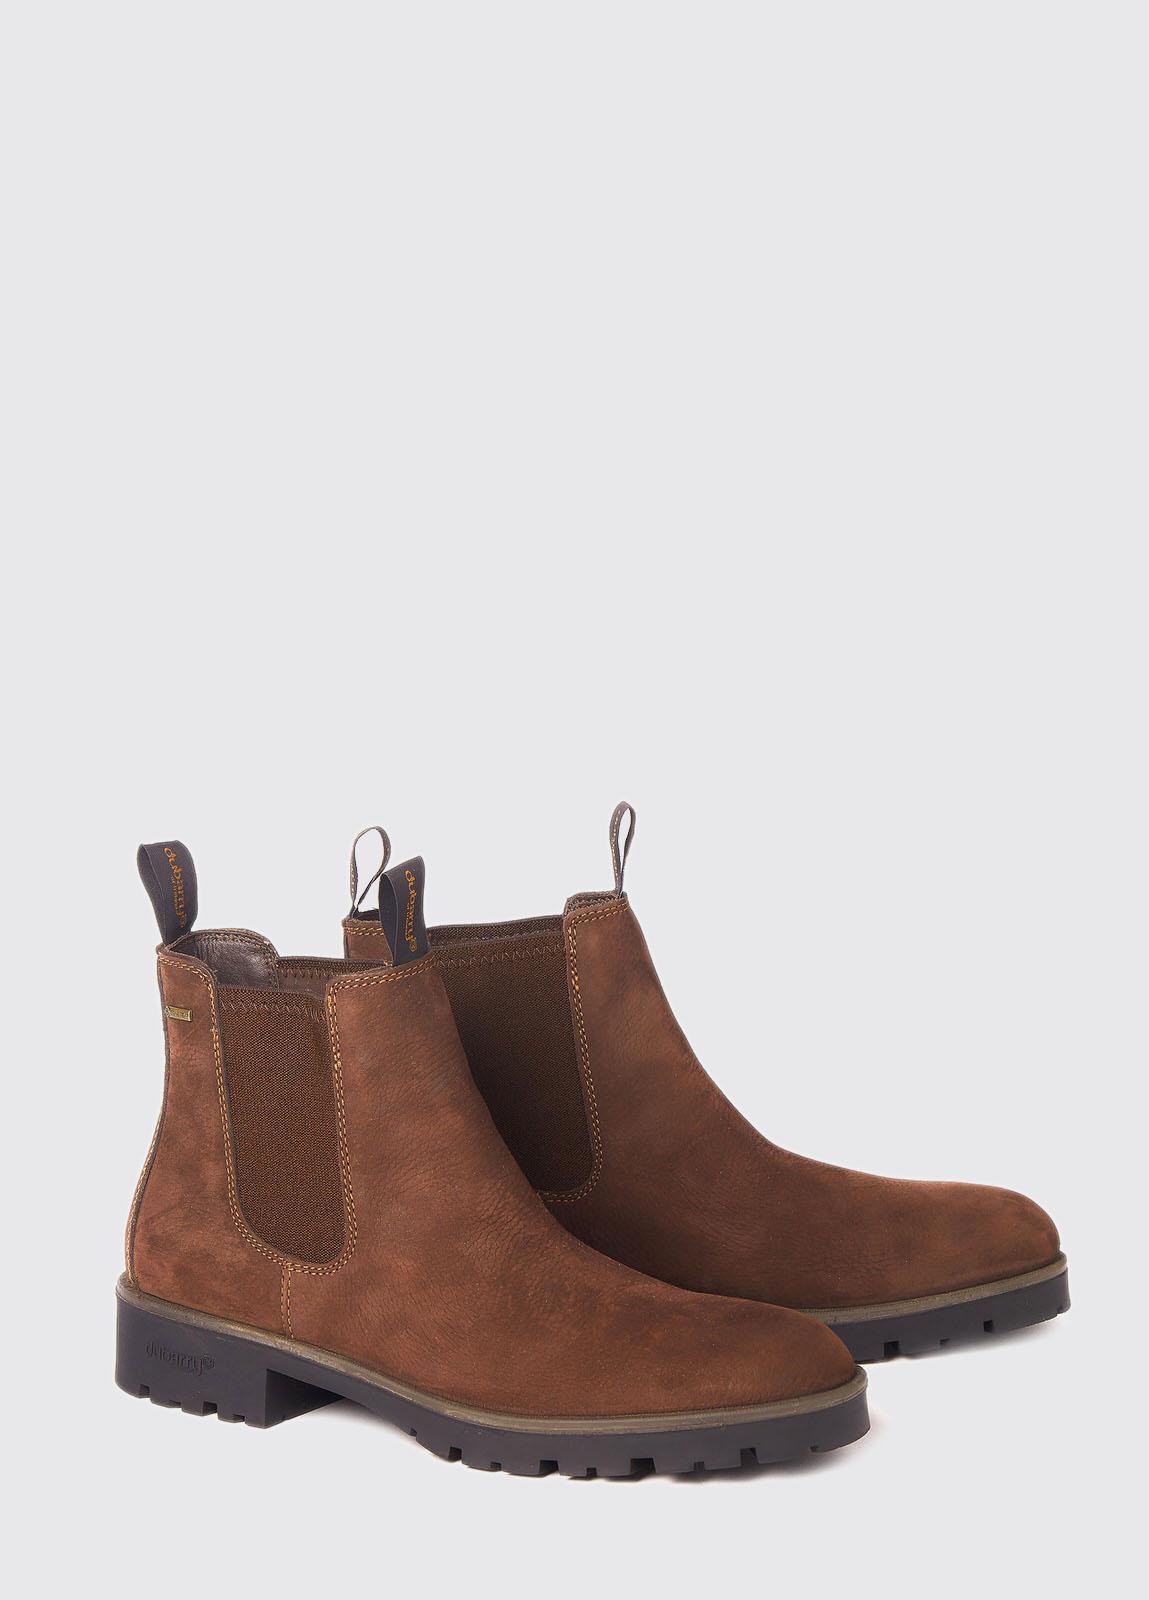 Antrim Country Boot - Walnut